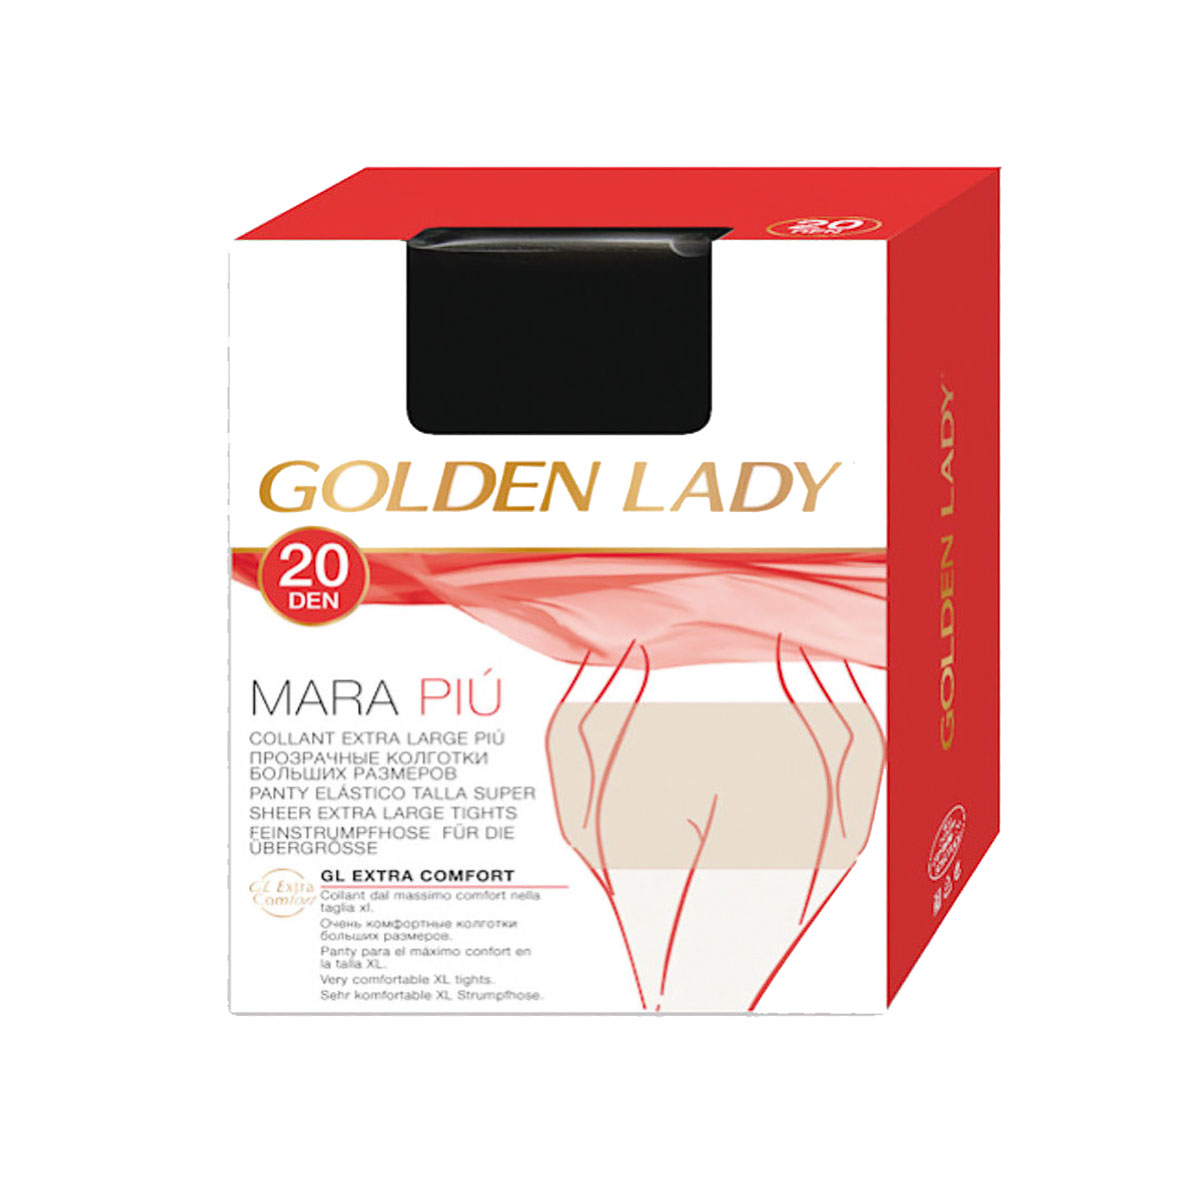 "GOLDEN LADY /""MARA 20/"" SET 20 COLLANT VELATI EXTRA LARGE COLORE CASTORO"